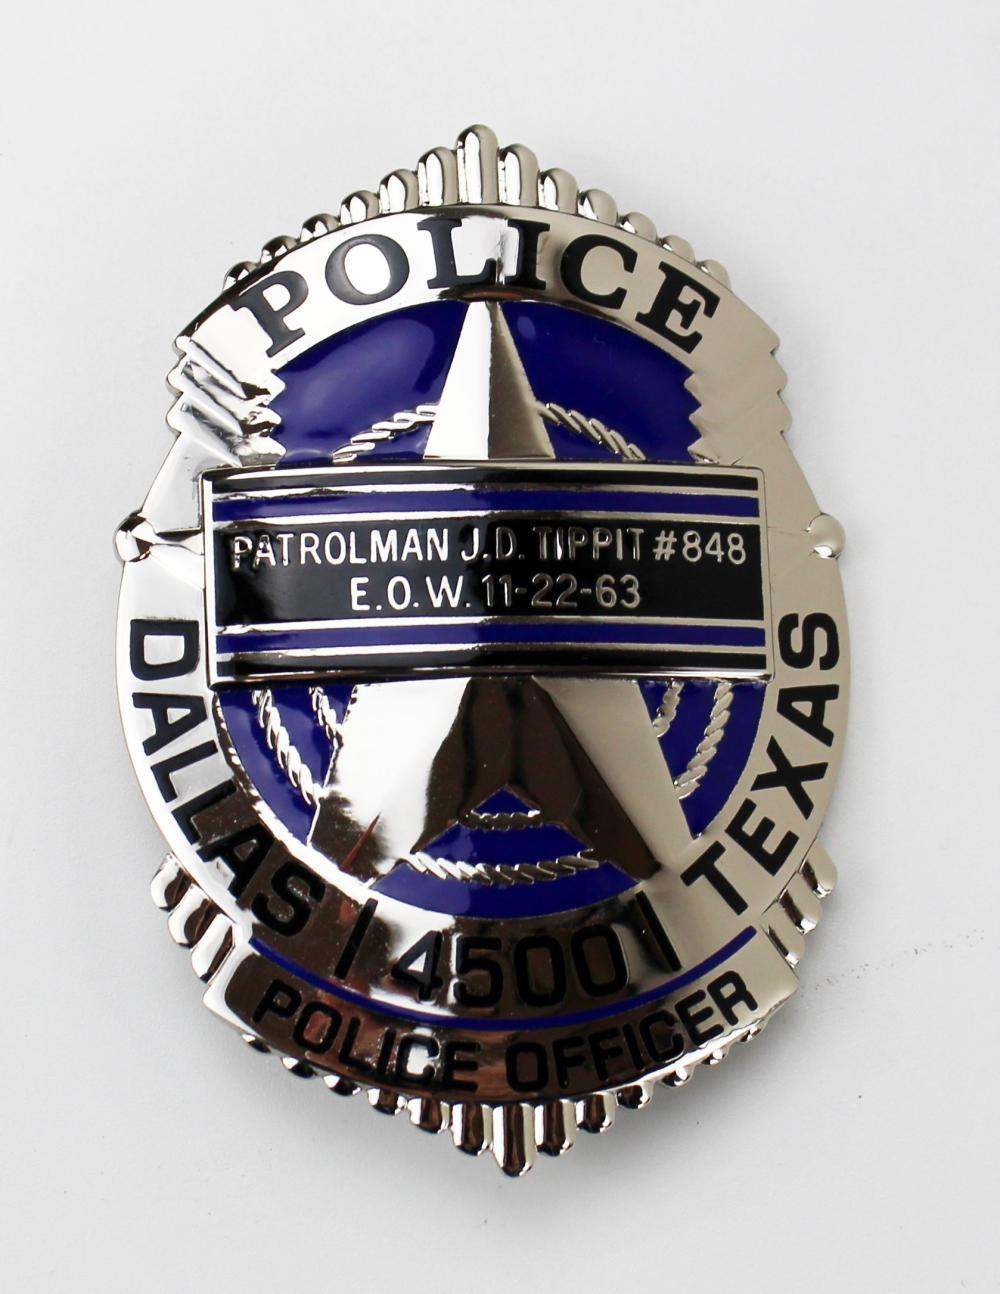 [John F. Kennedy] Dallas Police & Secret Service Badges and Pin